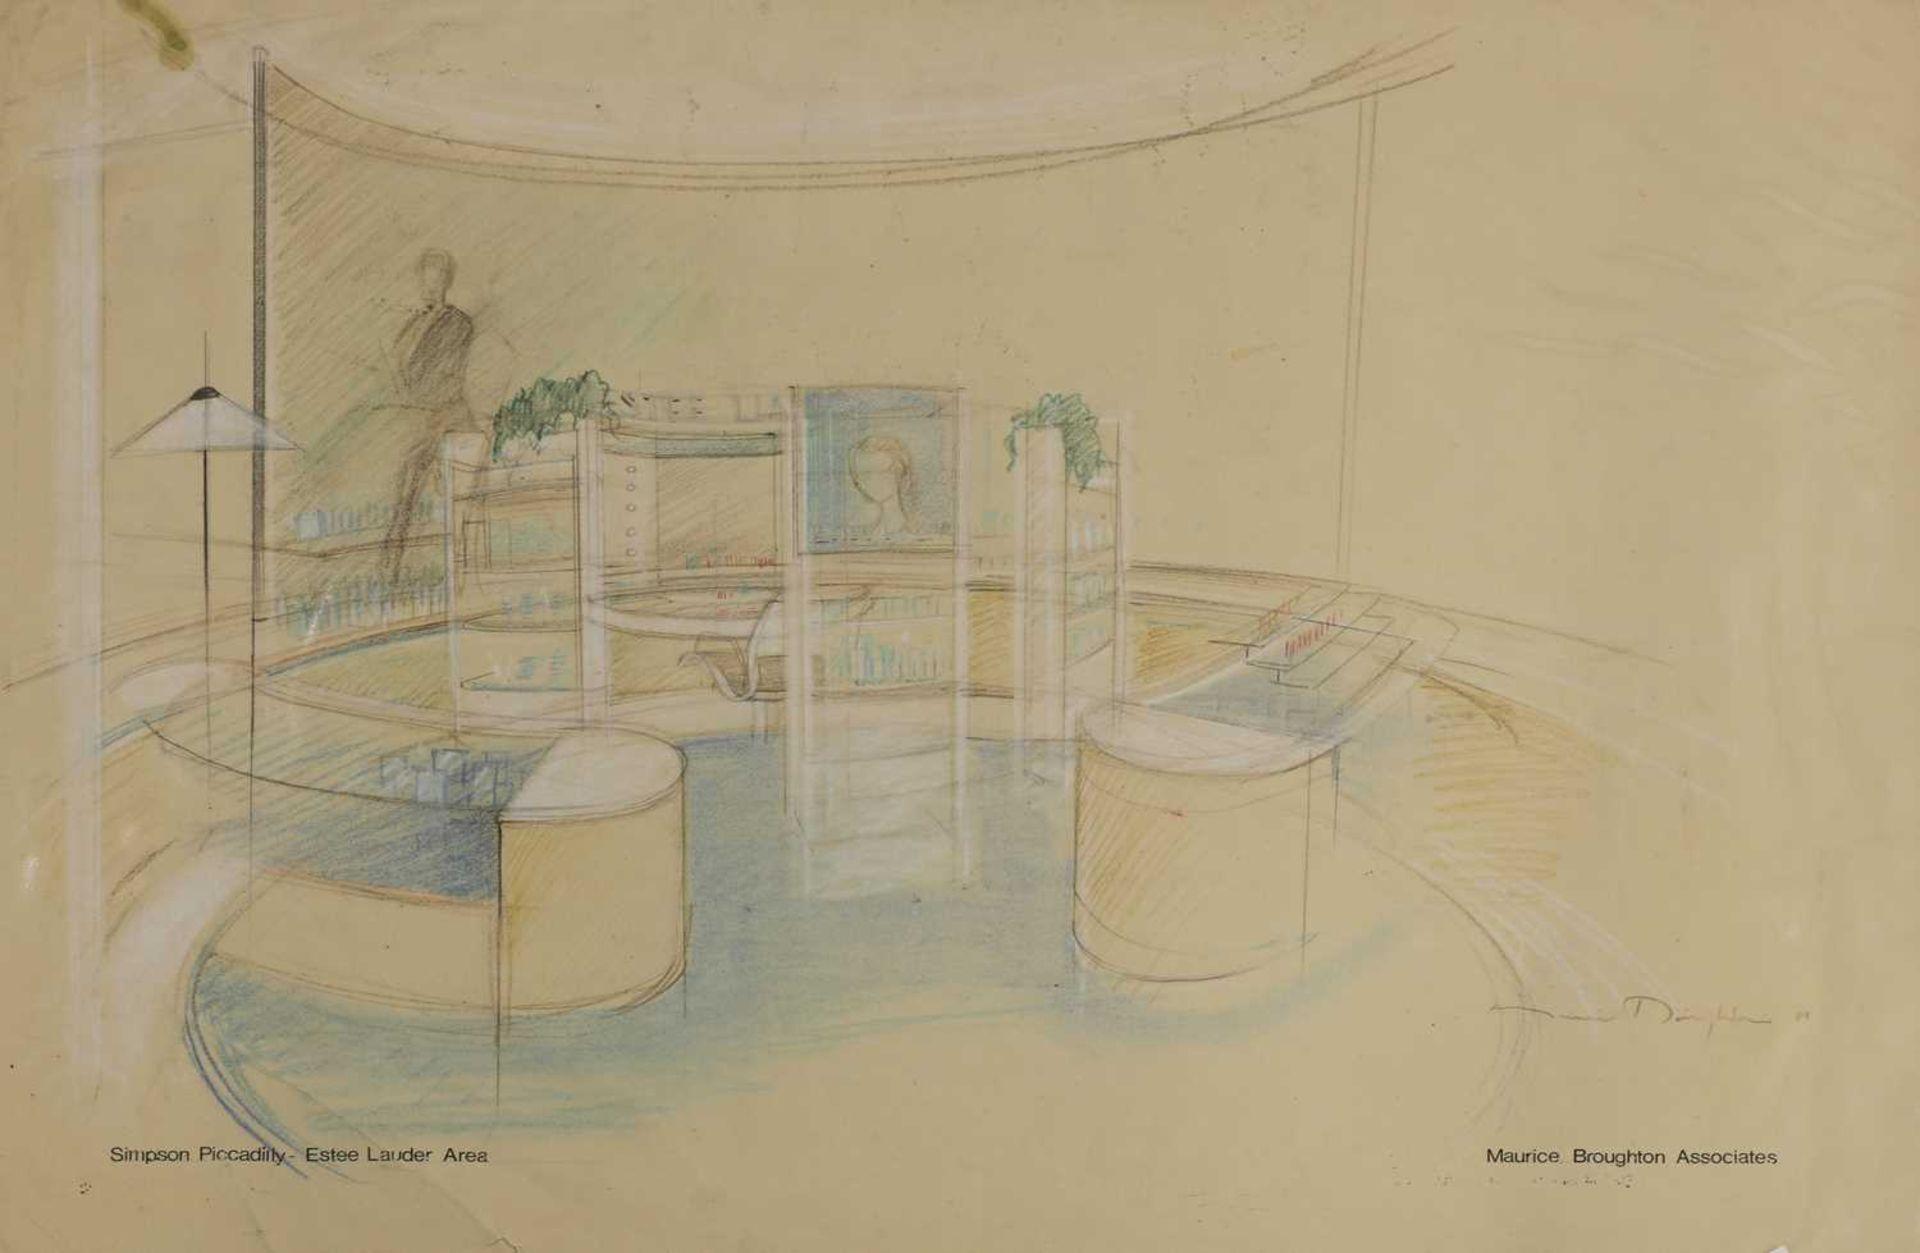 Maurice Broughton Associates, - Image 6 of 7